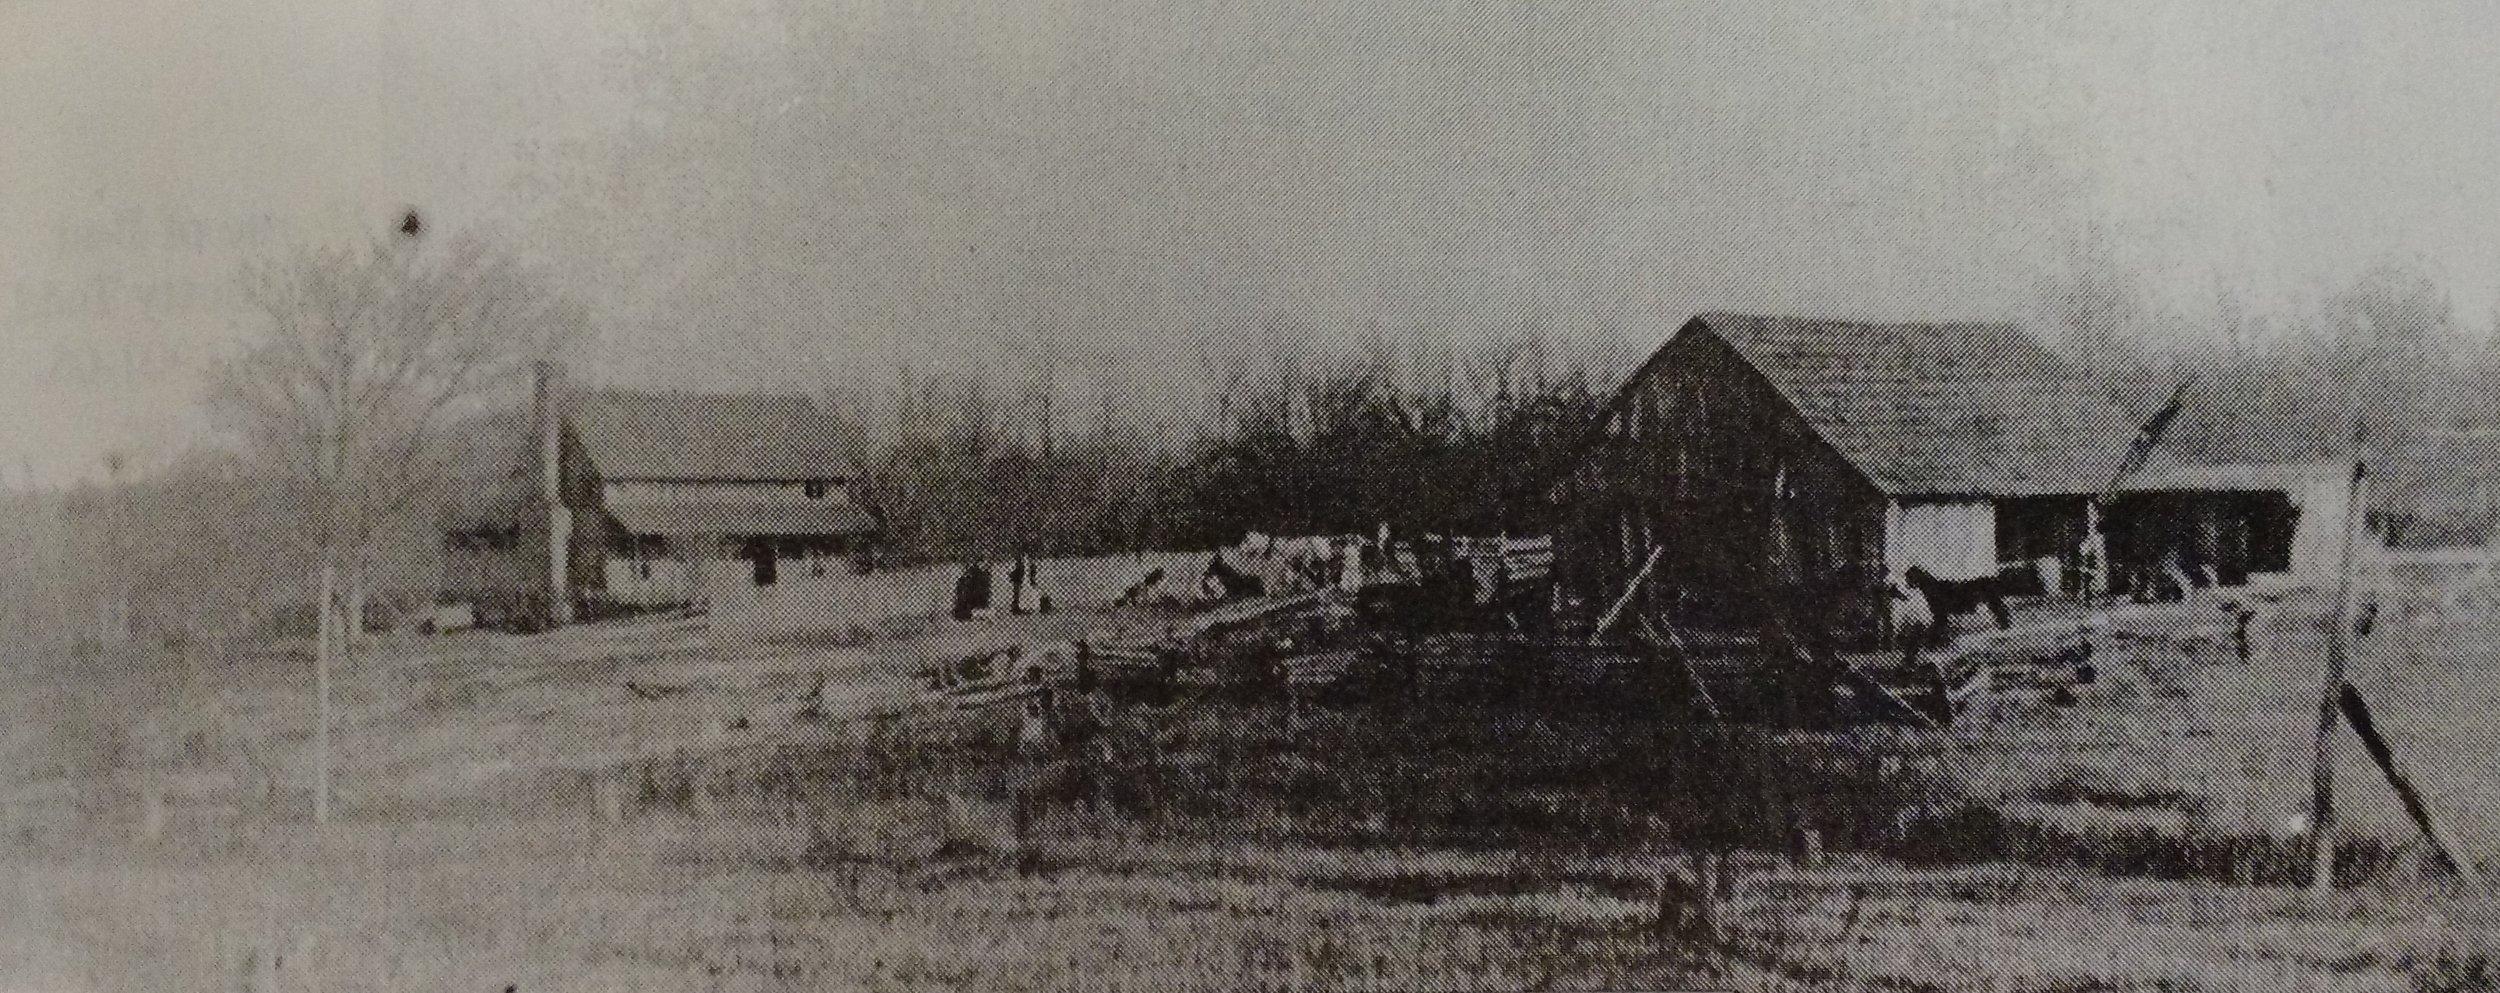 Fully fenced farmstead